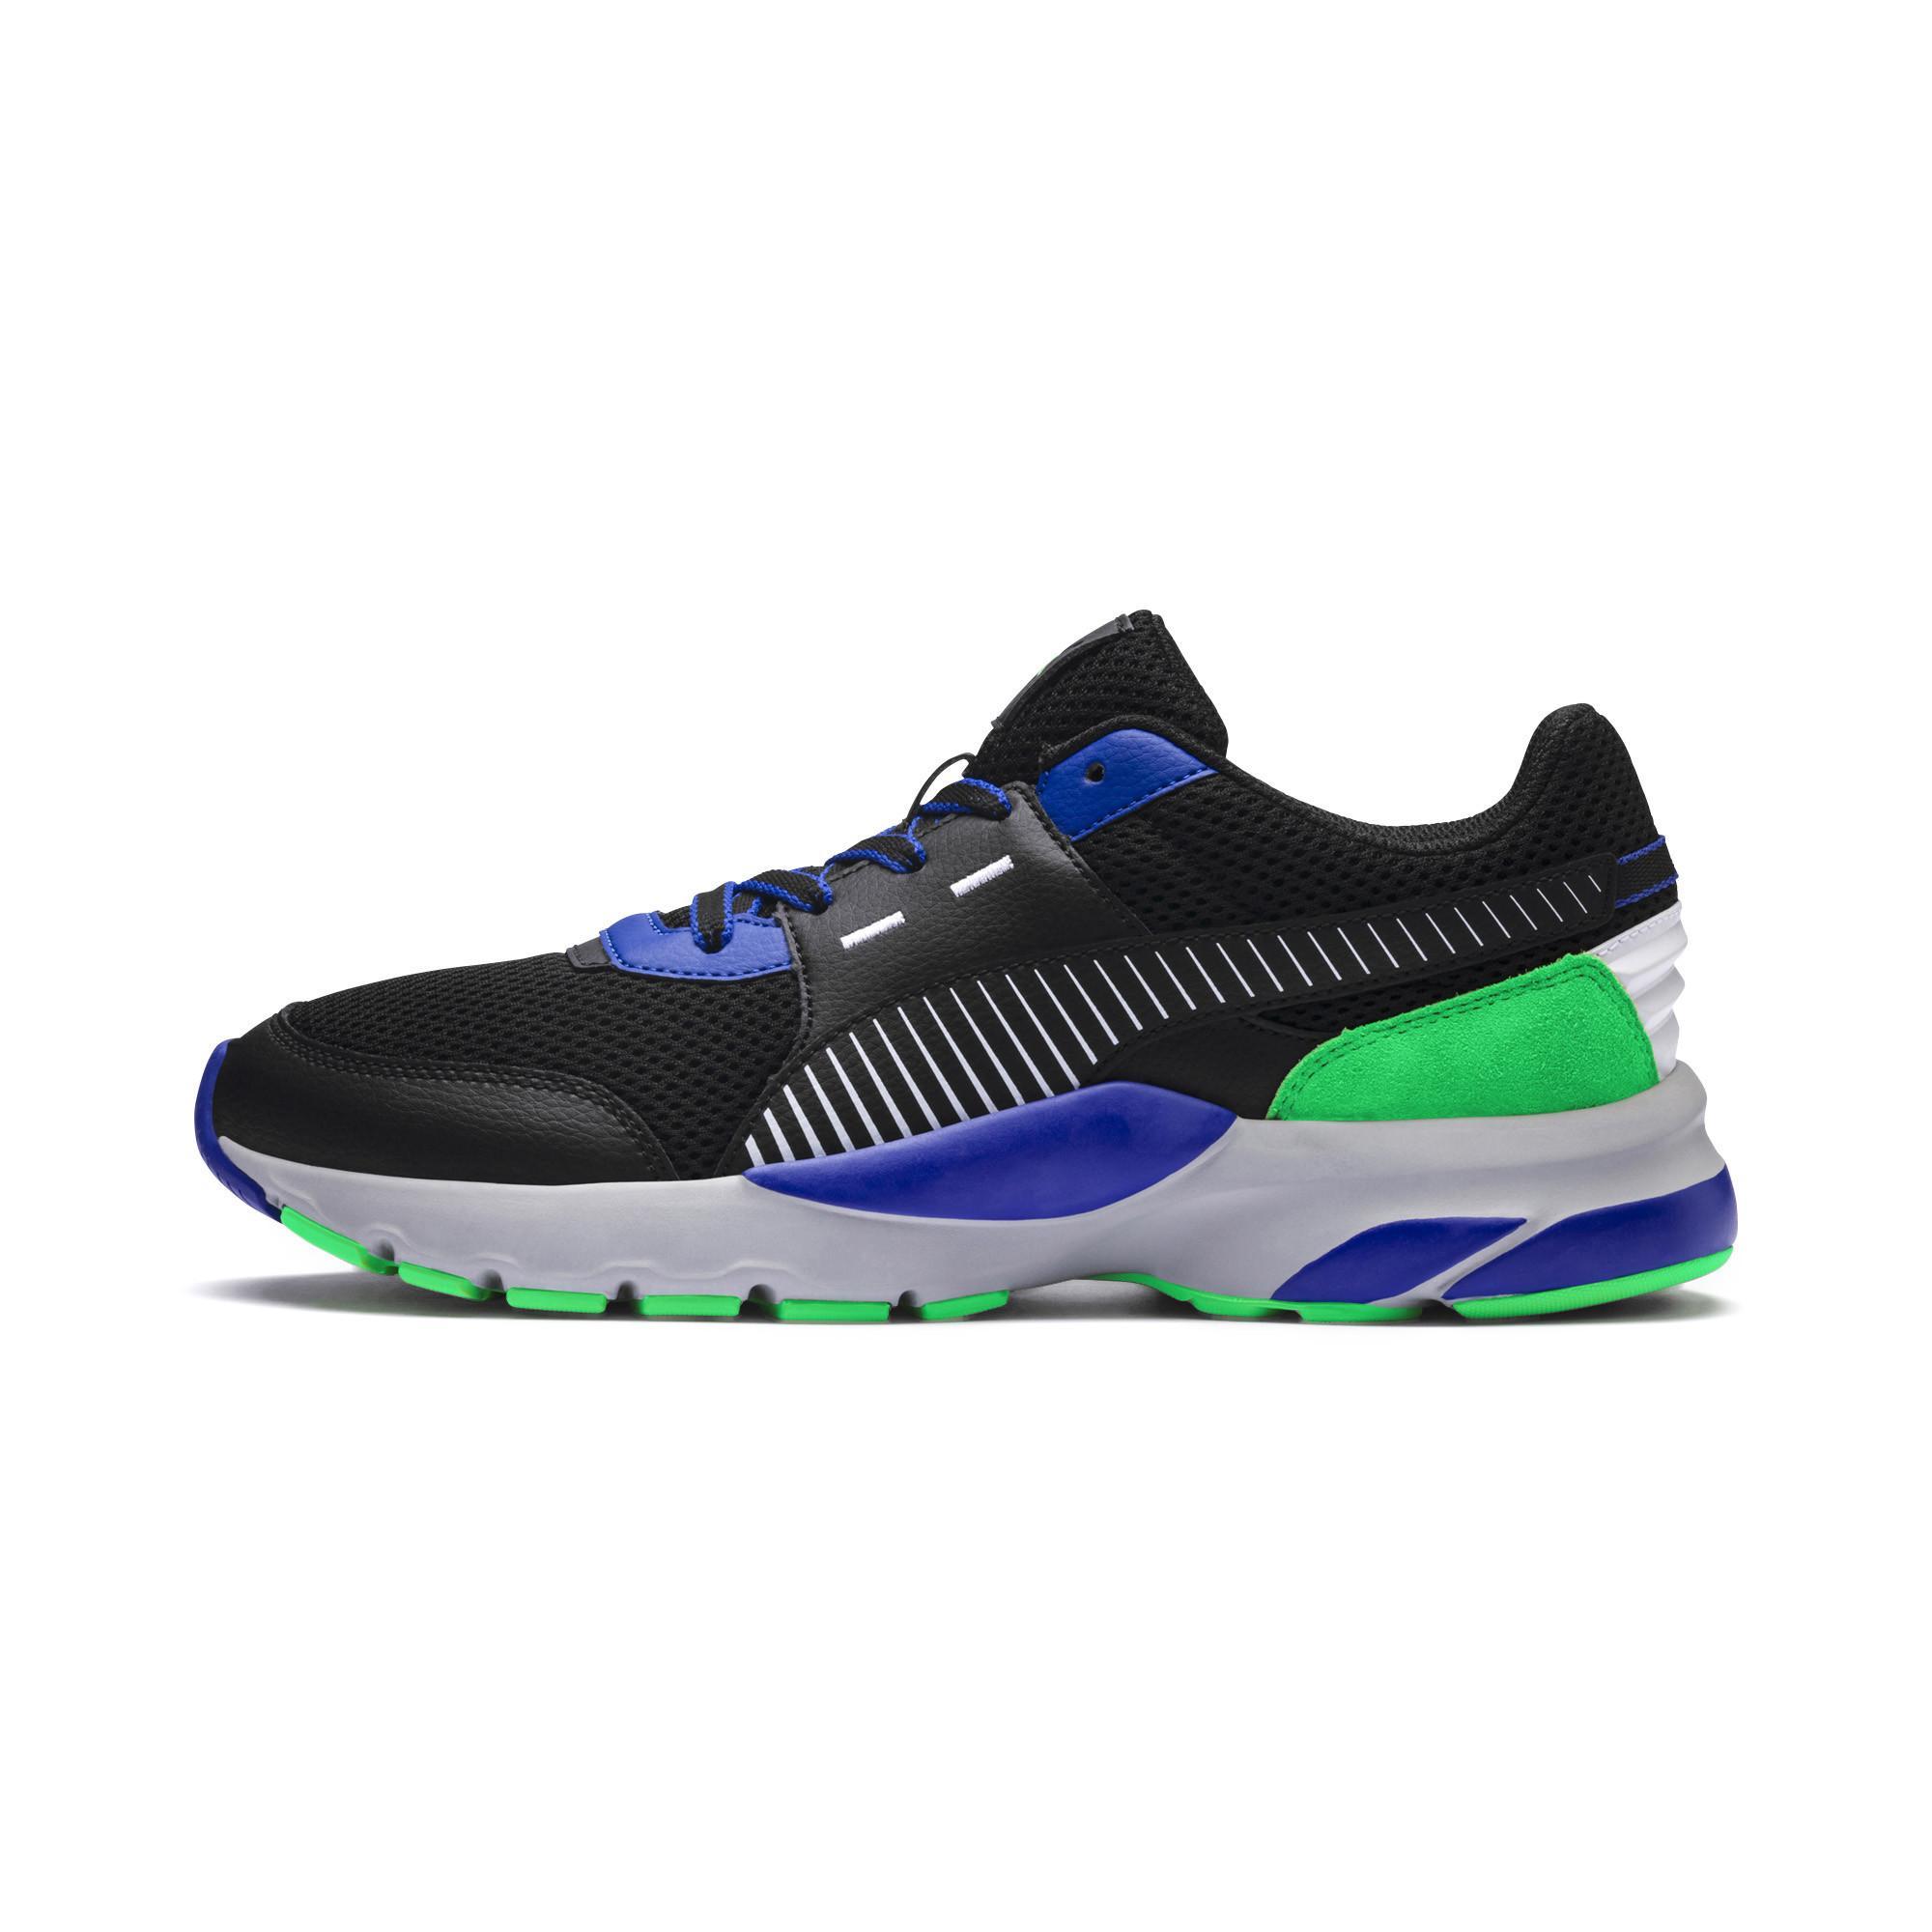 88ef65c7195a PUMA Multicolor Future Runner Premium Sneakers for men. View fullscreen